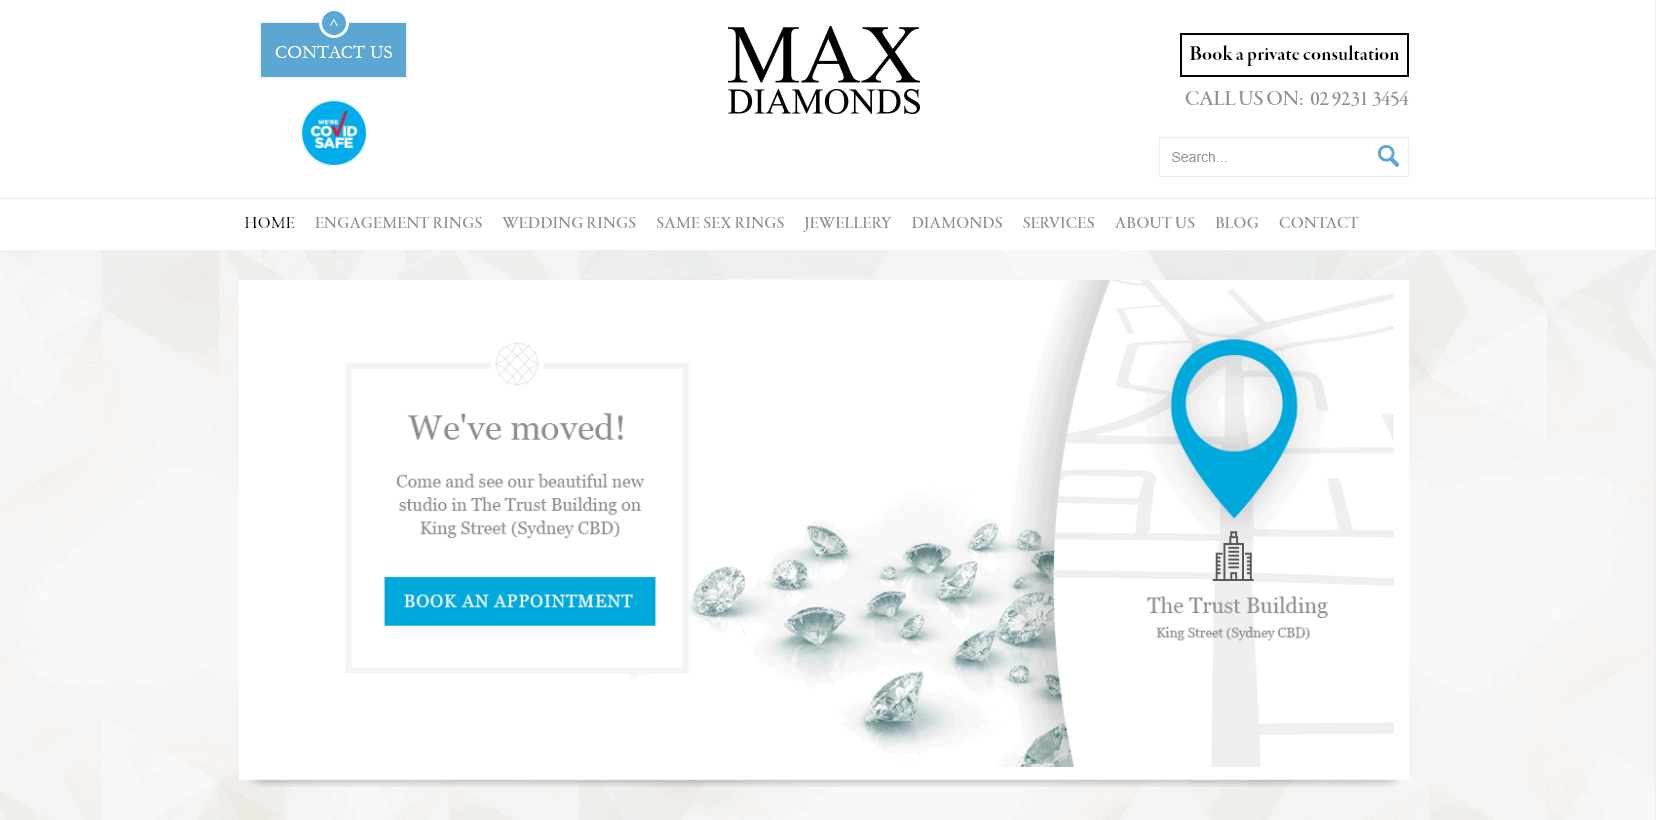 maxdiamonds